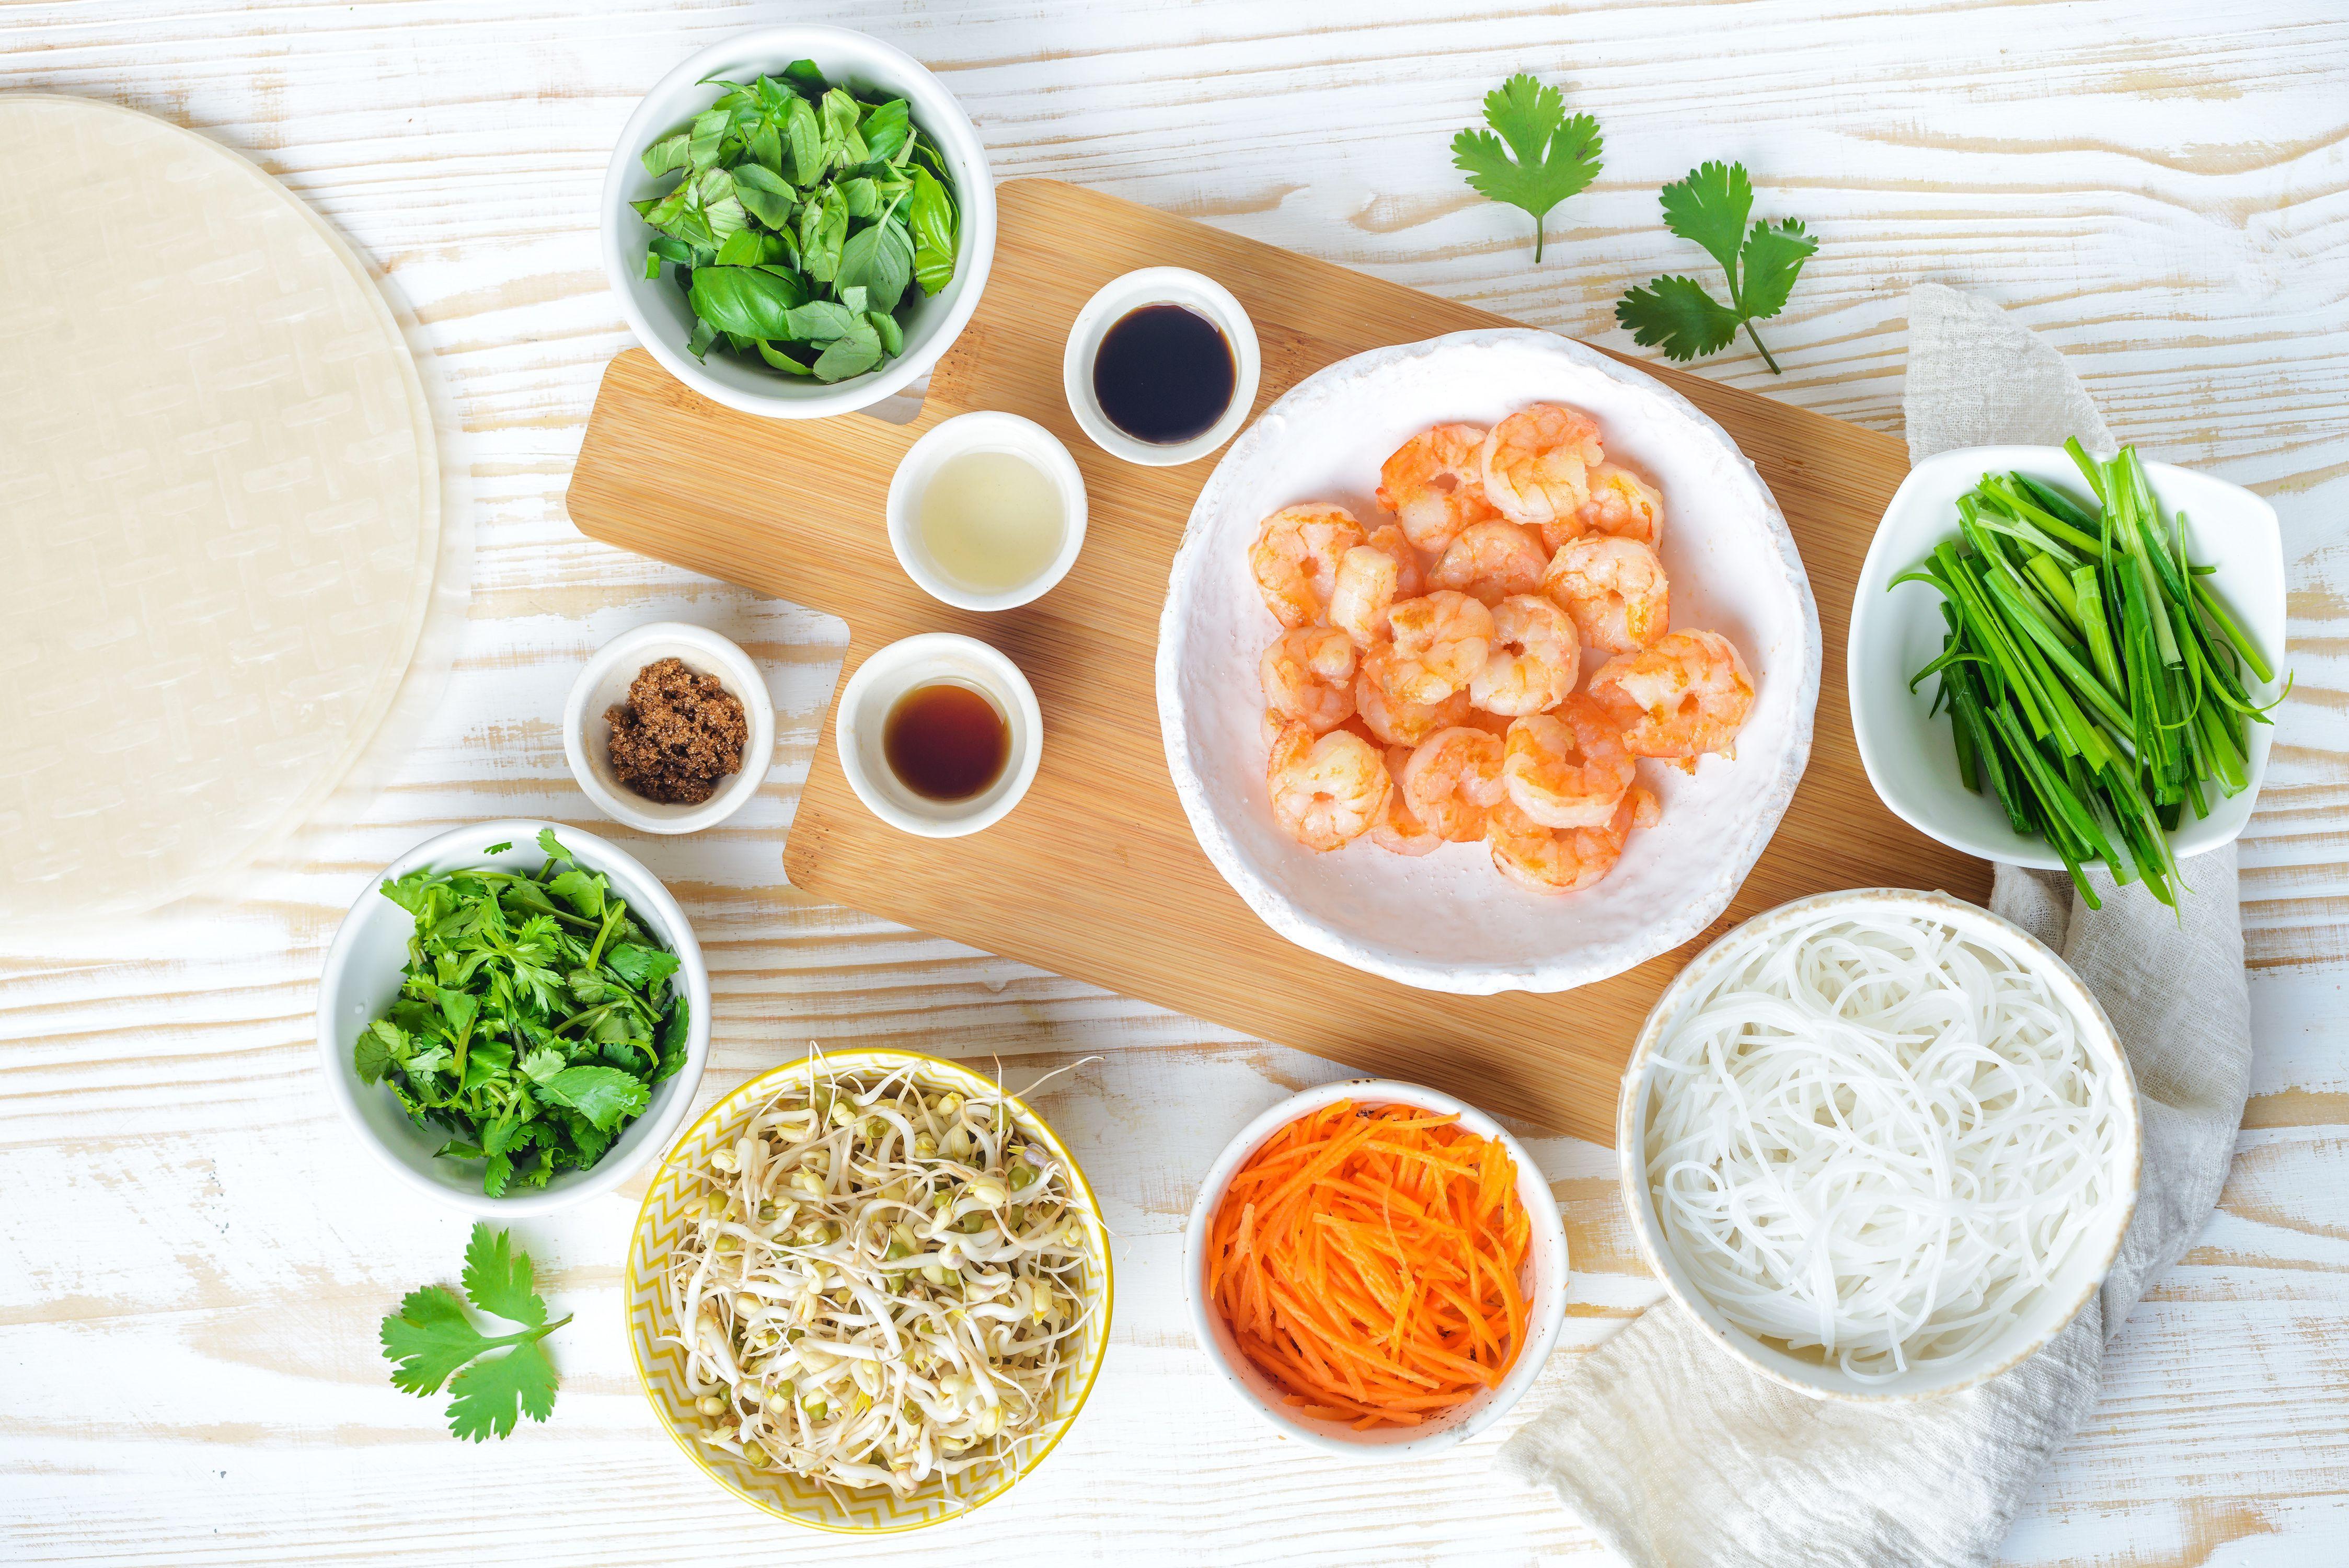 Ingredients for Thai fresh spring rolls